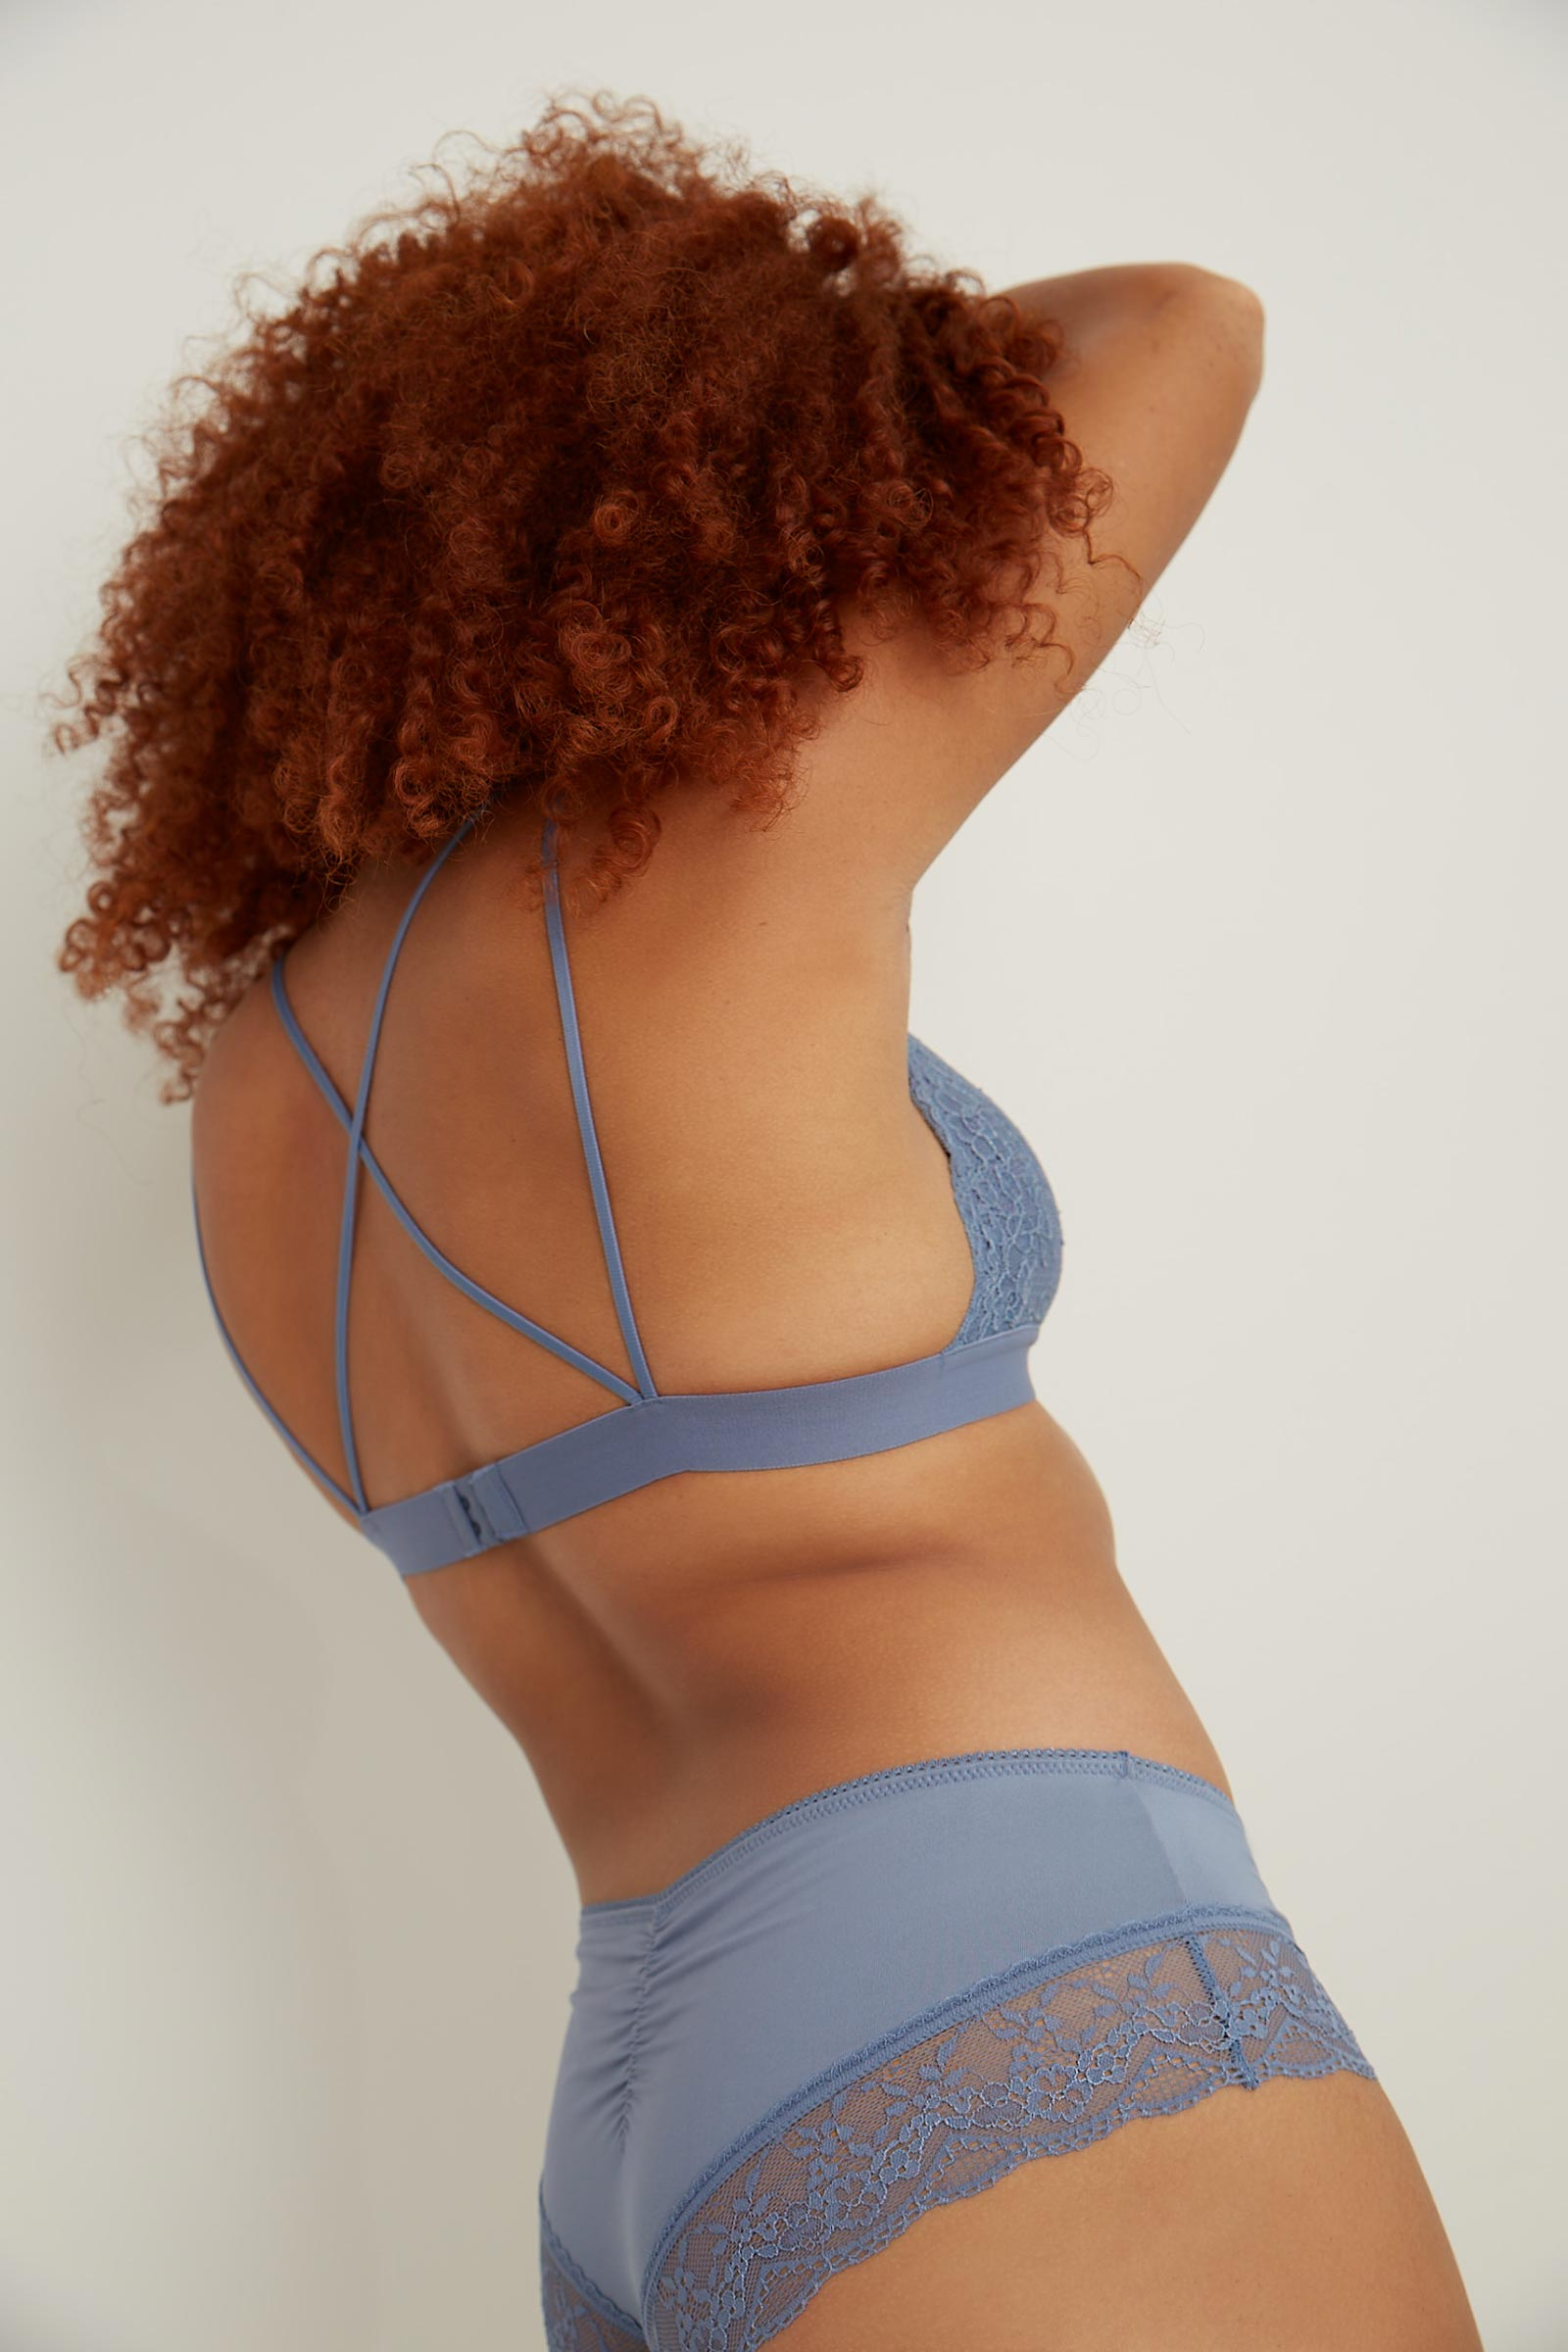 Crossed Strap Lace Bralette